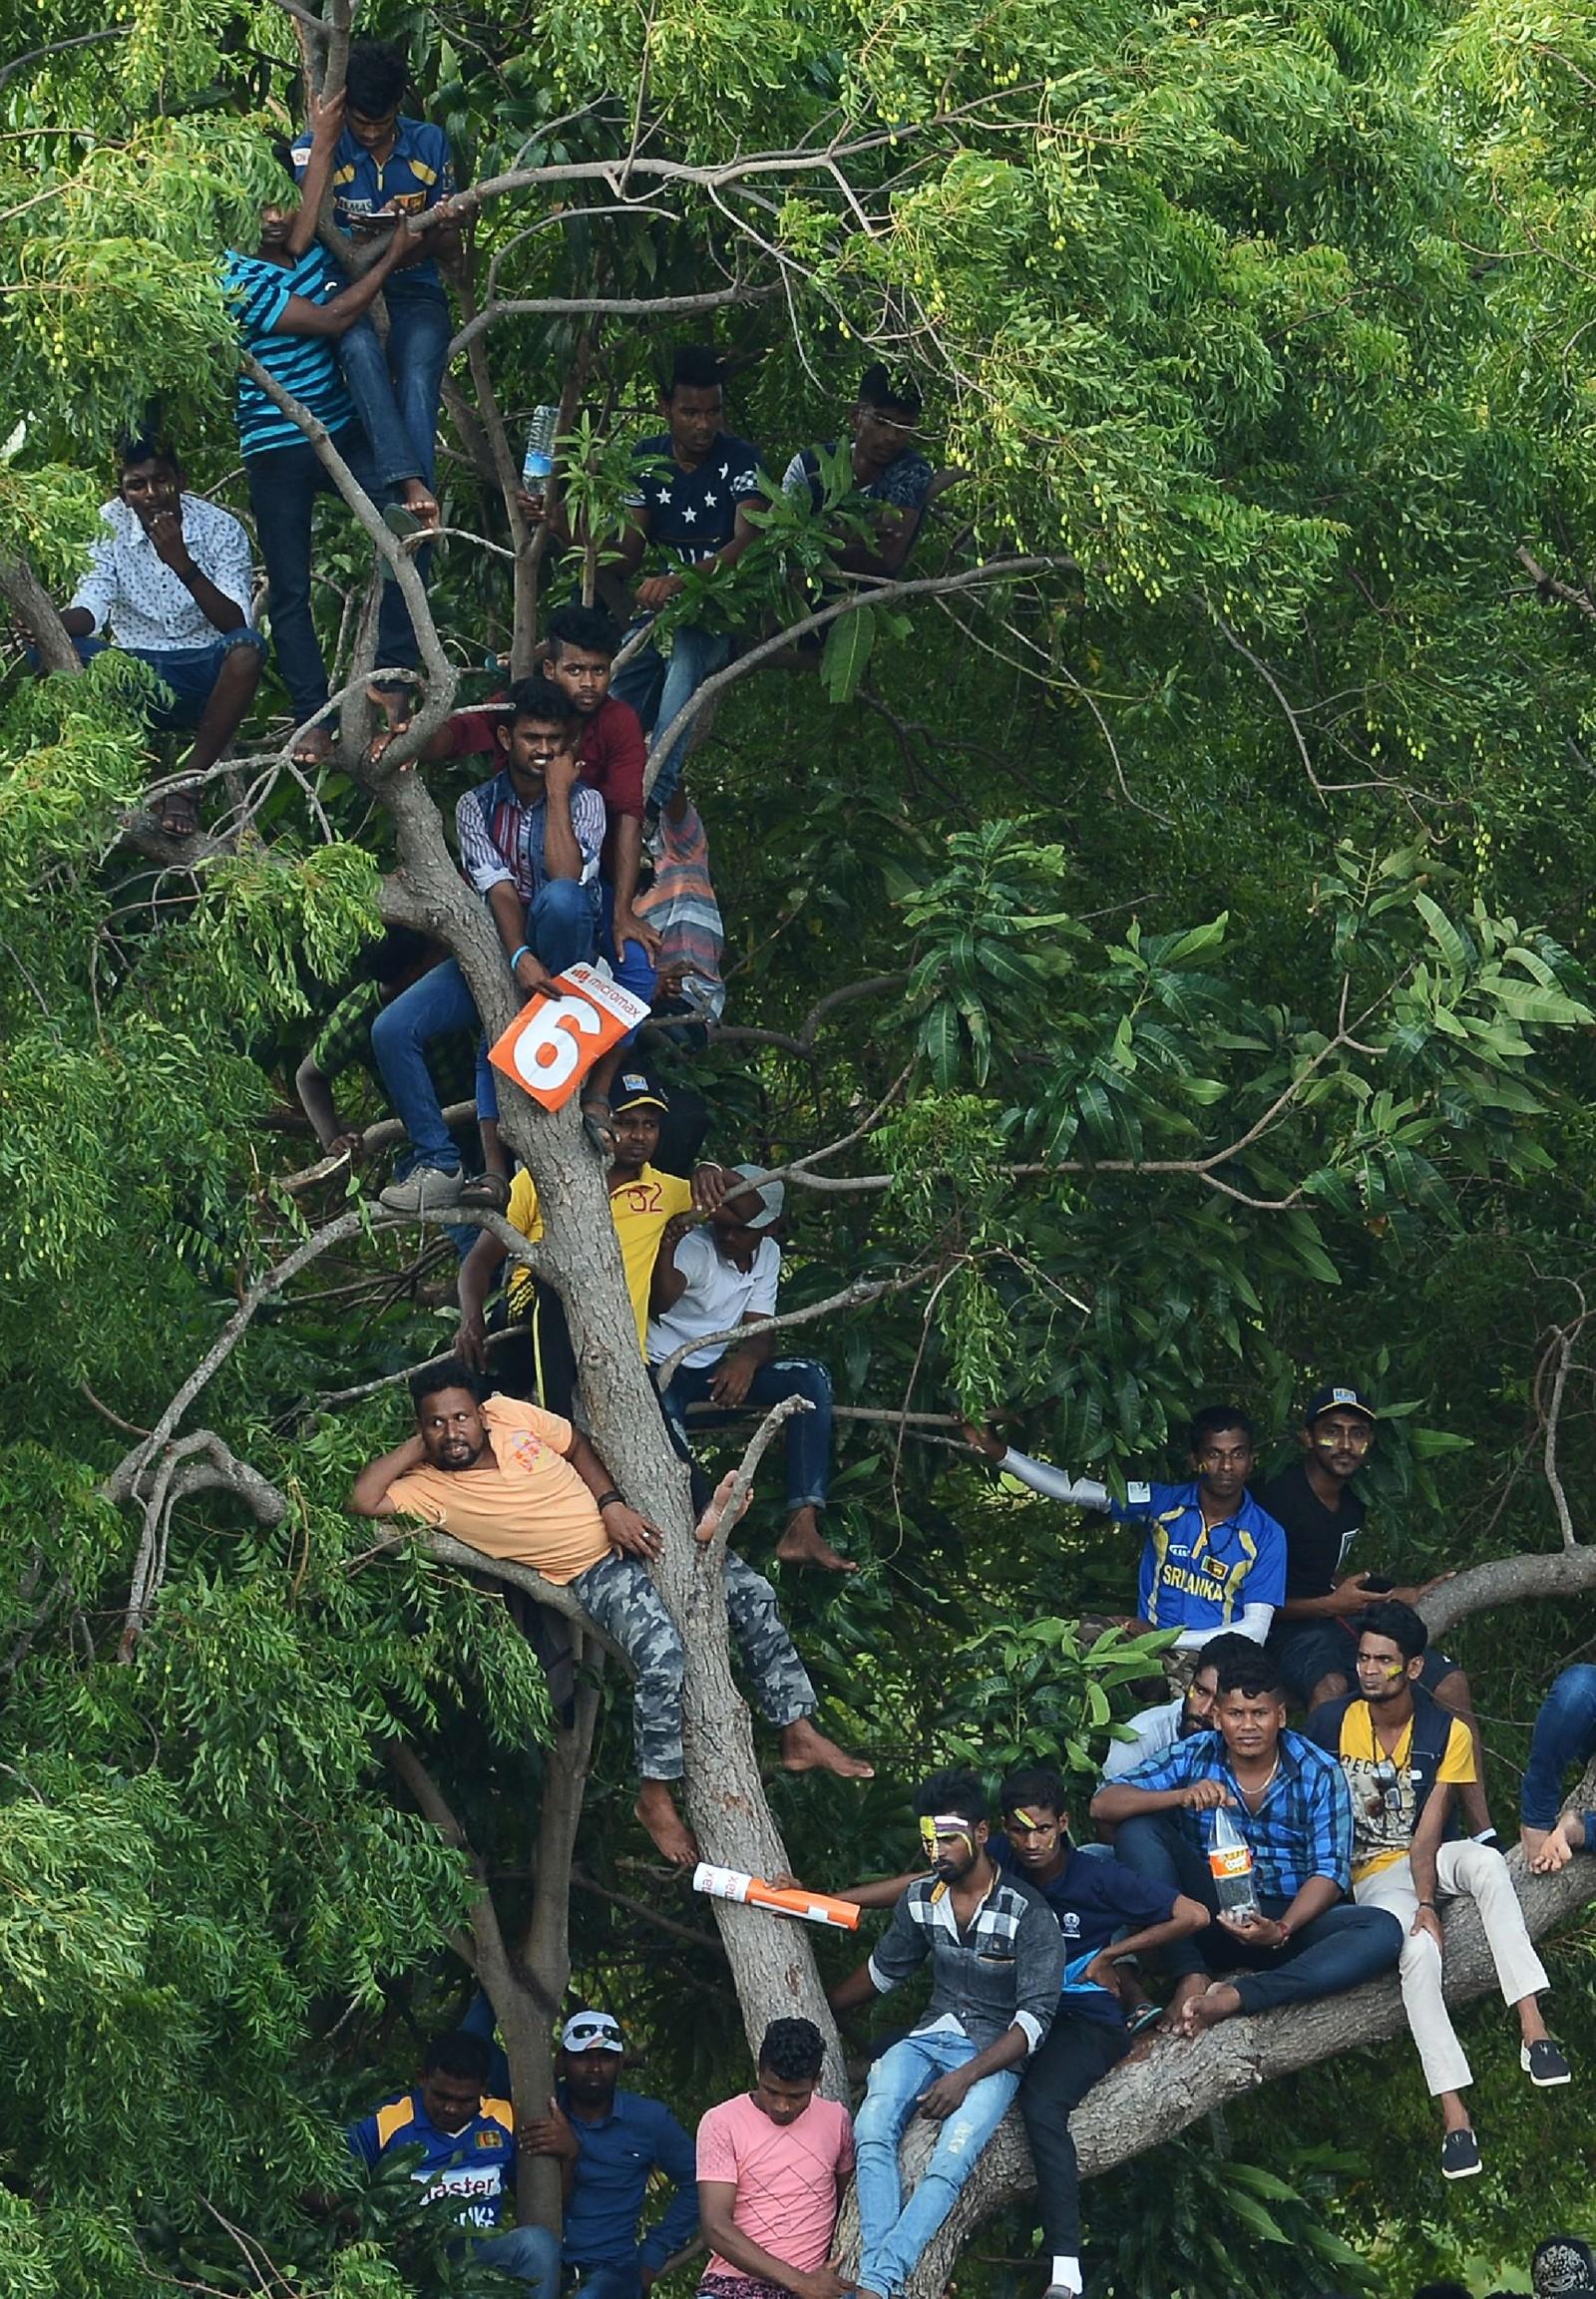 Voldsom interesse for cricket-kampen mellom Sri-Lanka og India forrige søndag. Det spilles fem kamper og i skrivende stund leder India 2-0.